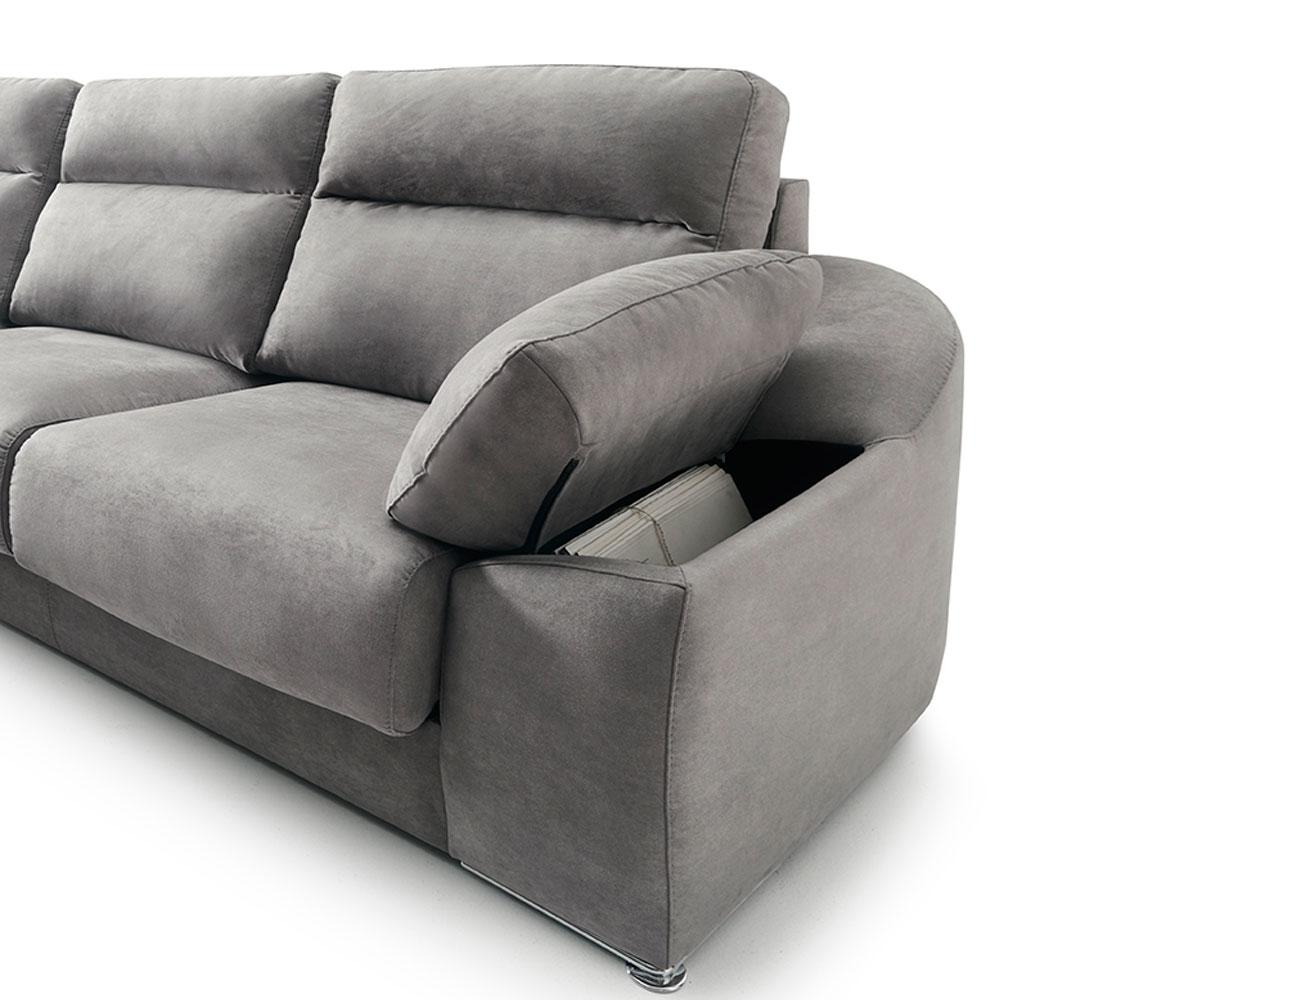 Sofa chaiselongue asientos viscolastica pedro ortiz 31